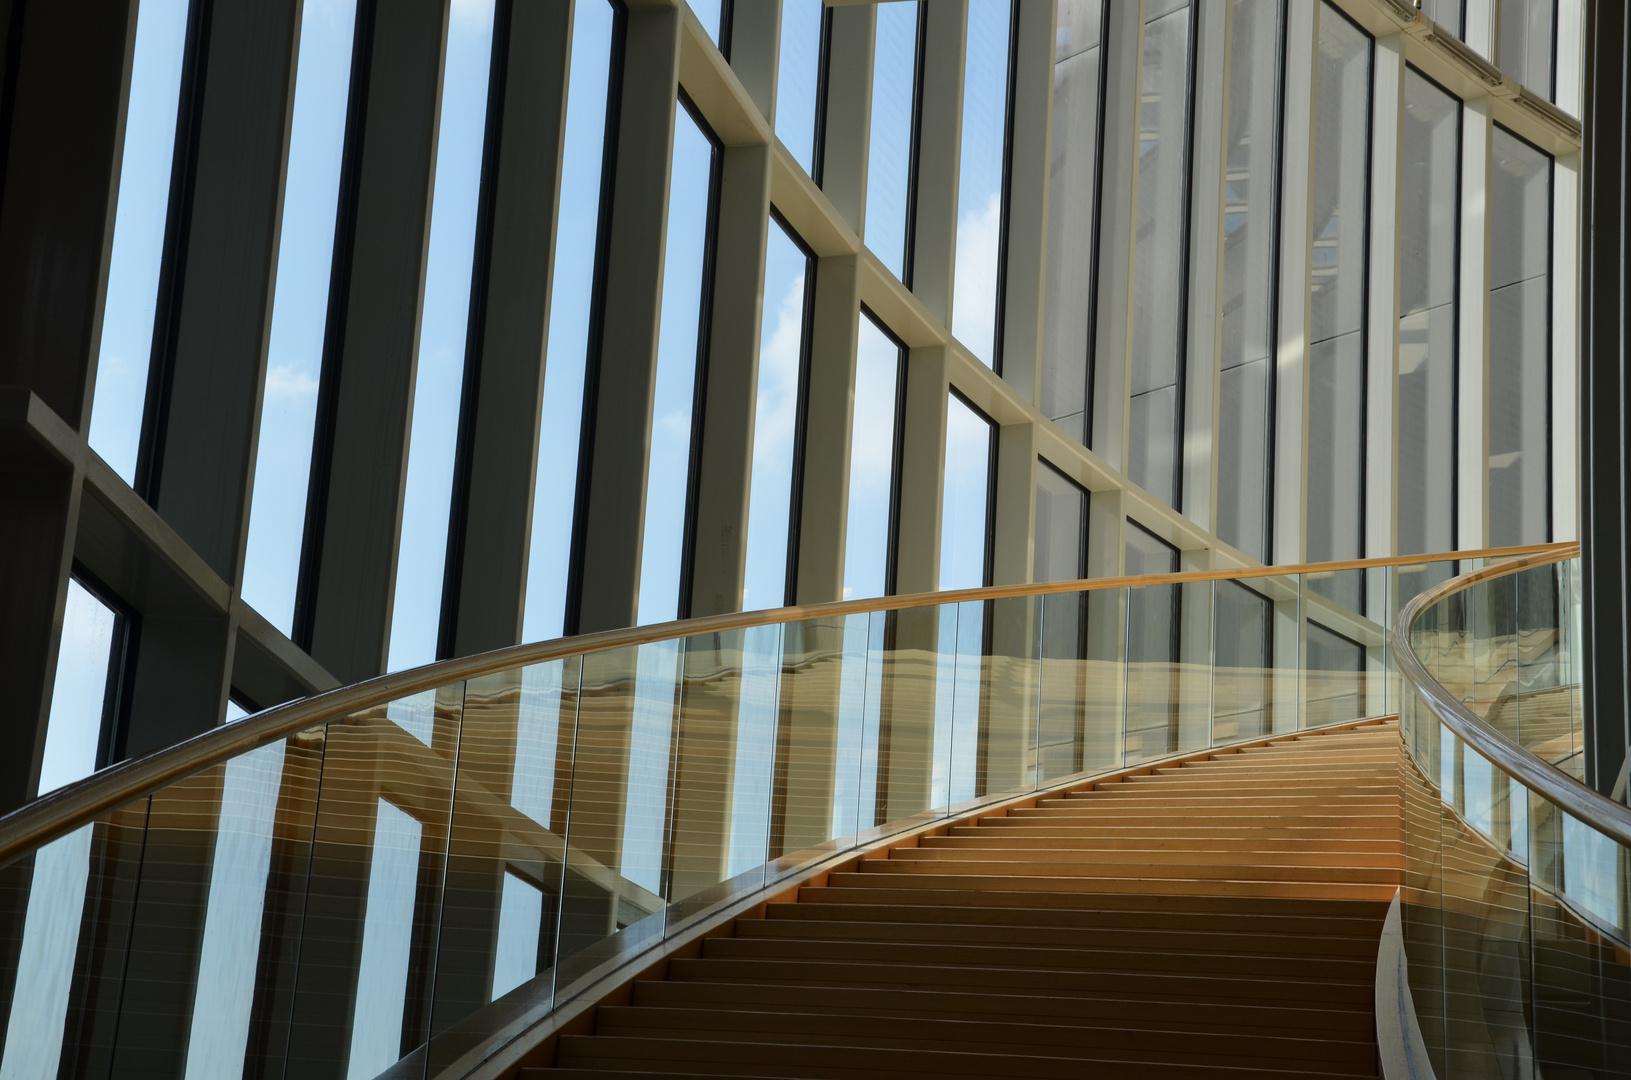 Treppe im Landtag Düsseldorf